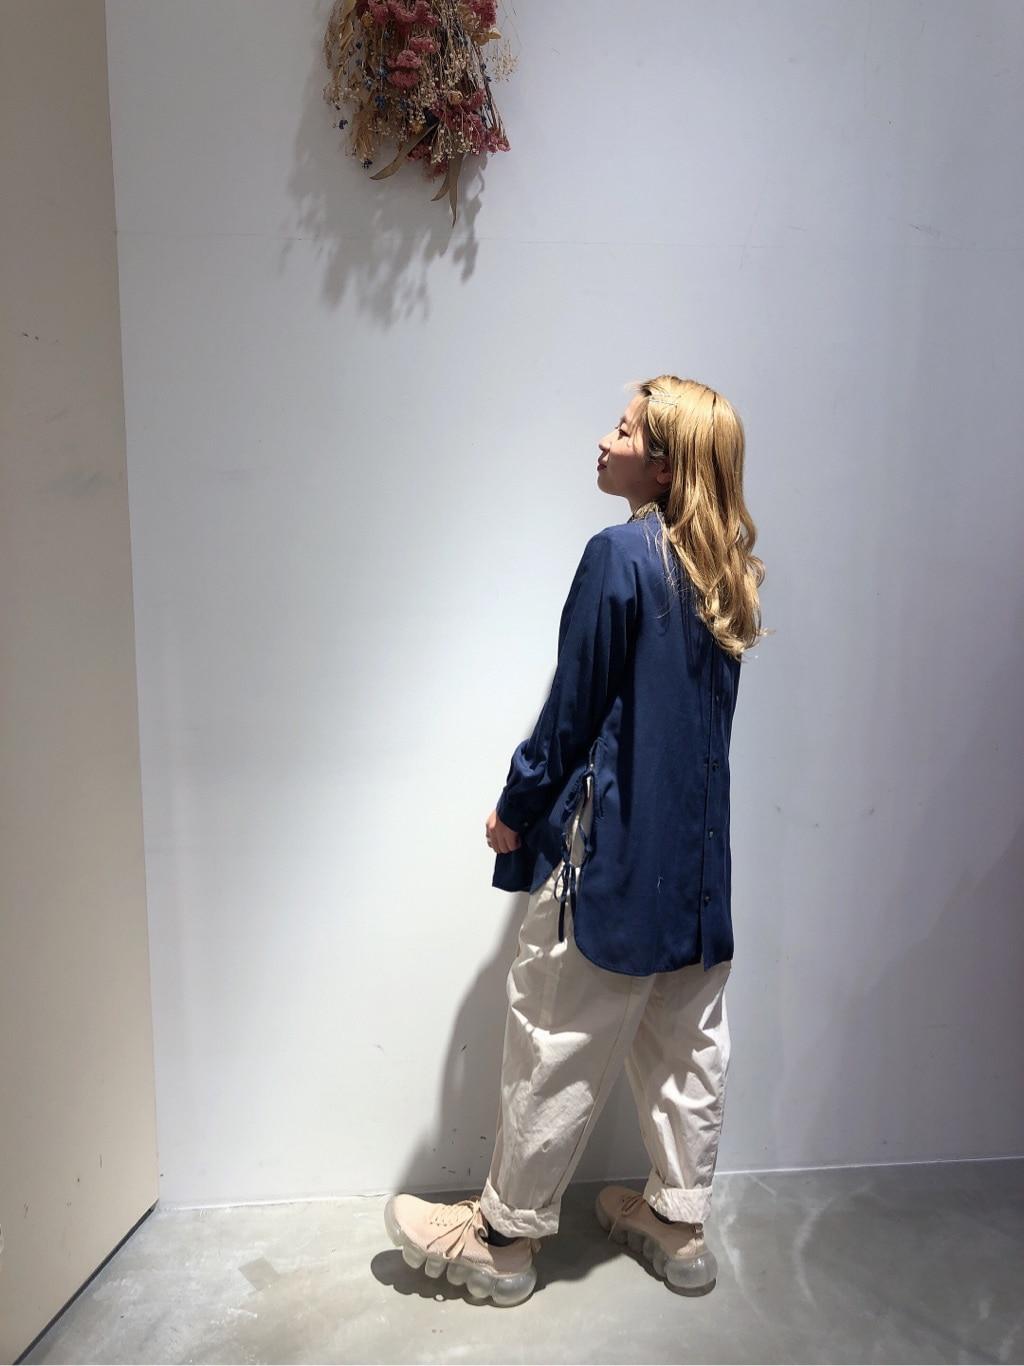 bulle de savon 阪急西宮ガーデンズ 身長:152cm 2020.04.17